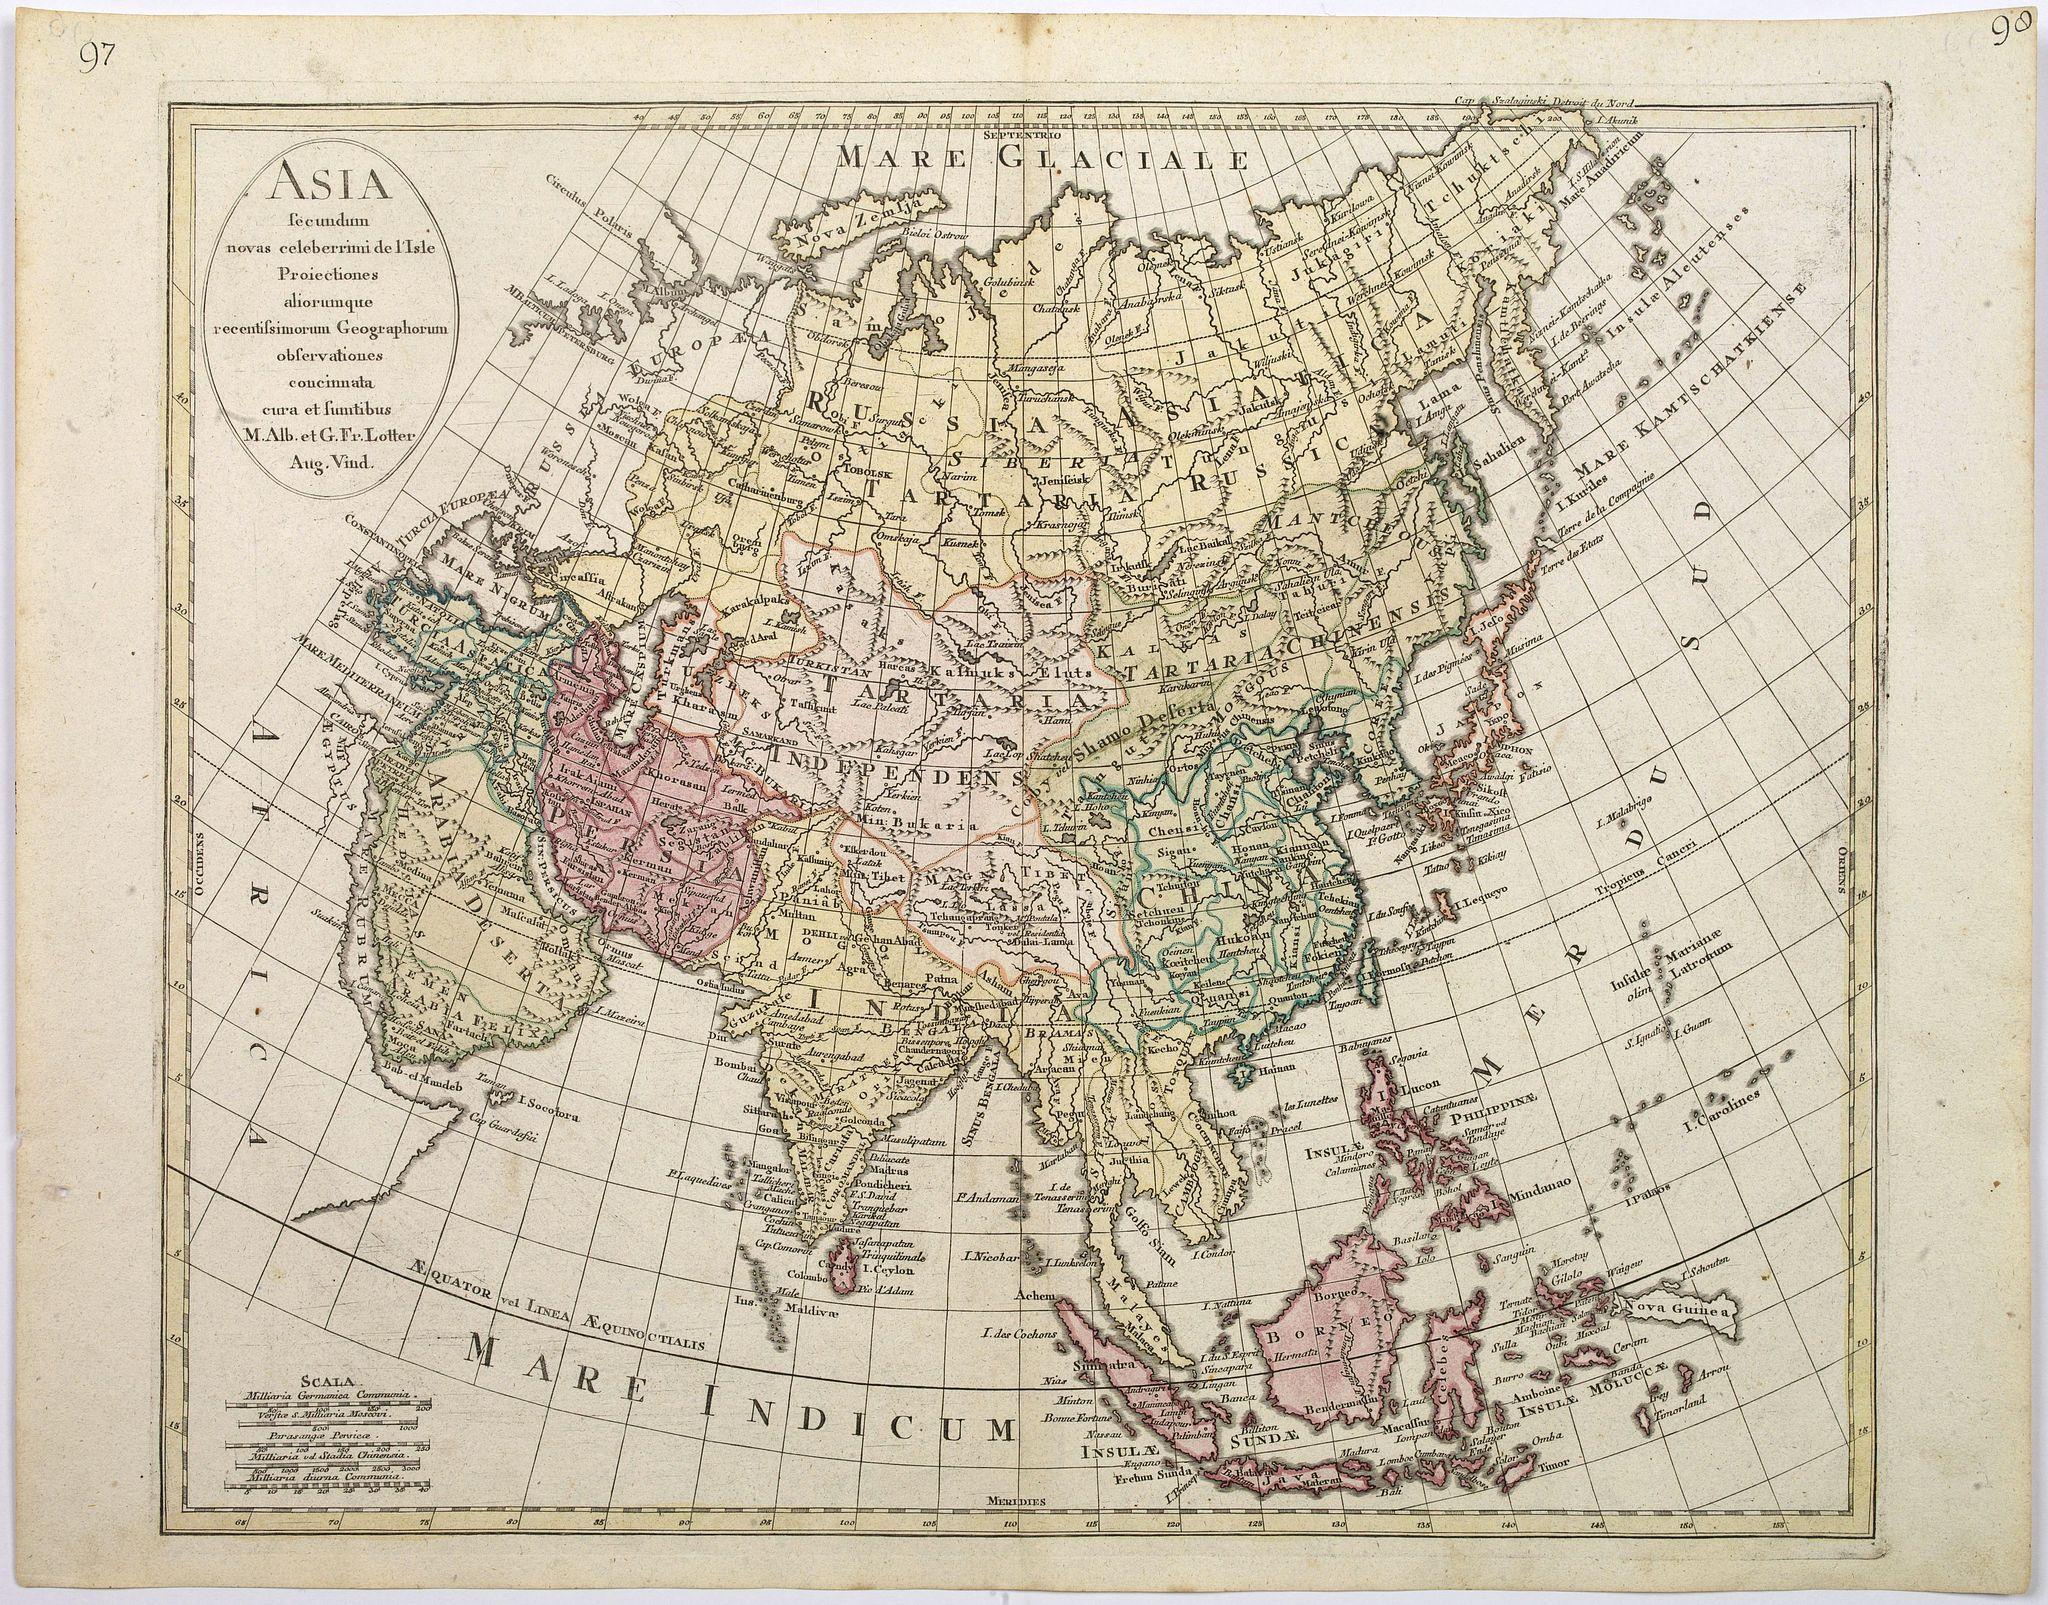 LOTTER, Matthaus Albrecht [and] Georg Friedrich. - Asia secundum novas celeberrimi de l'Isle Projectiones aliorumque. . .